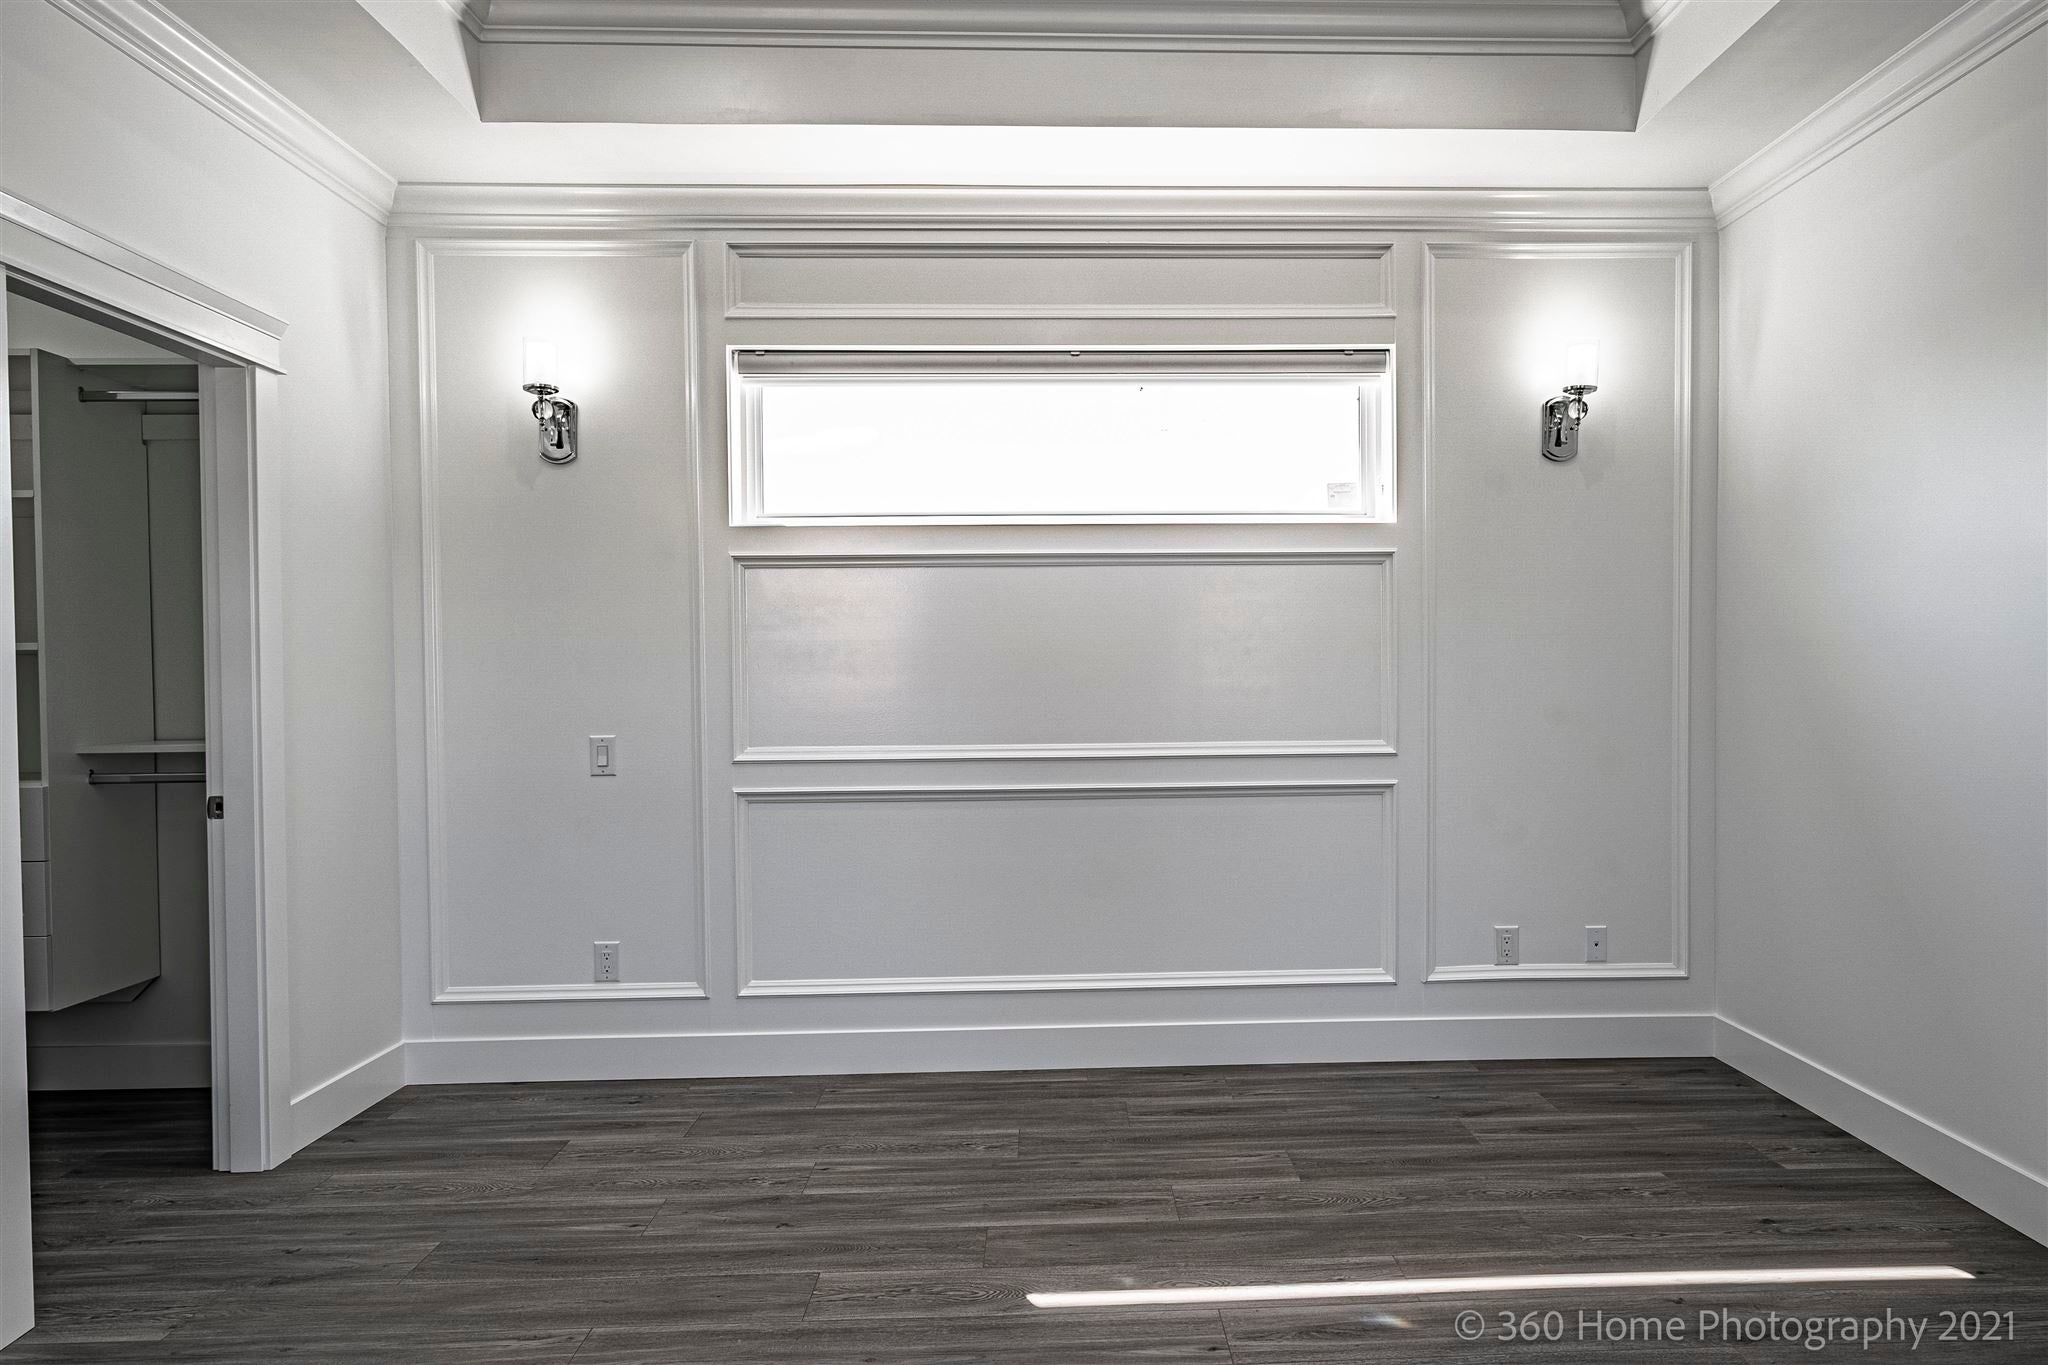 13050 101B AVENUE - Cedar Hills House/Single Family for sale, 5 Bedrooms (R2602208) - #19